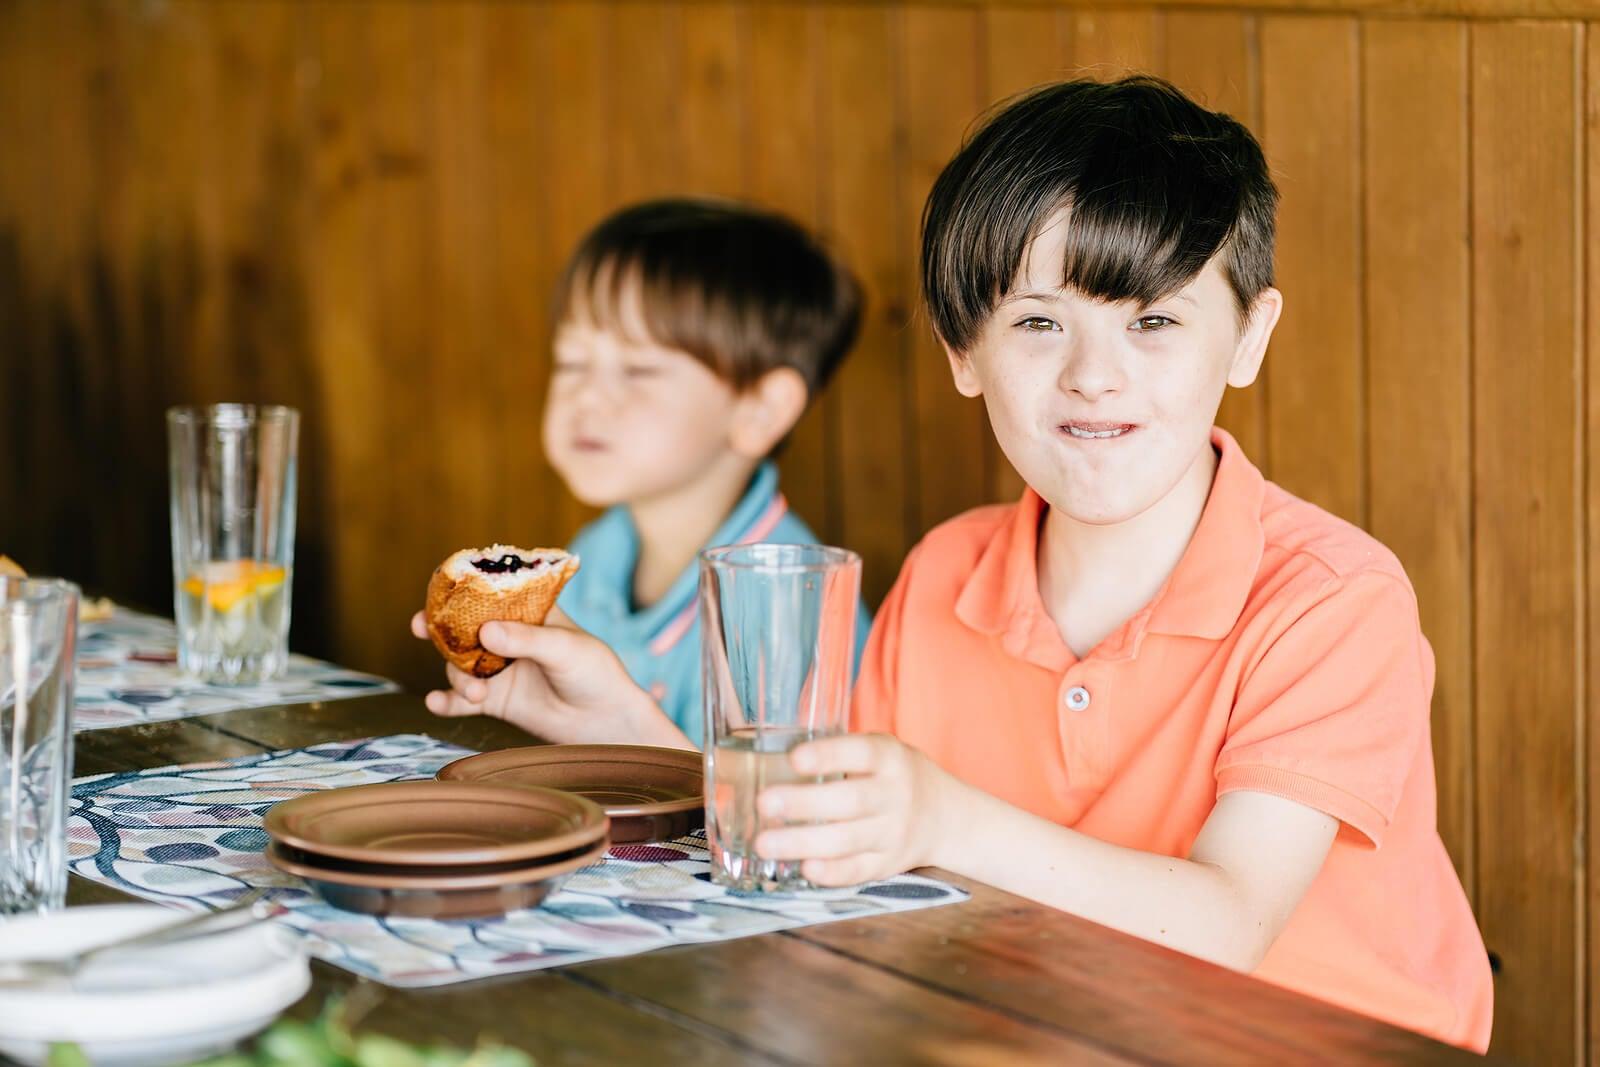 Niño con síndrome de Phelan-McDermid comiendo.